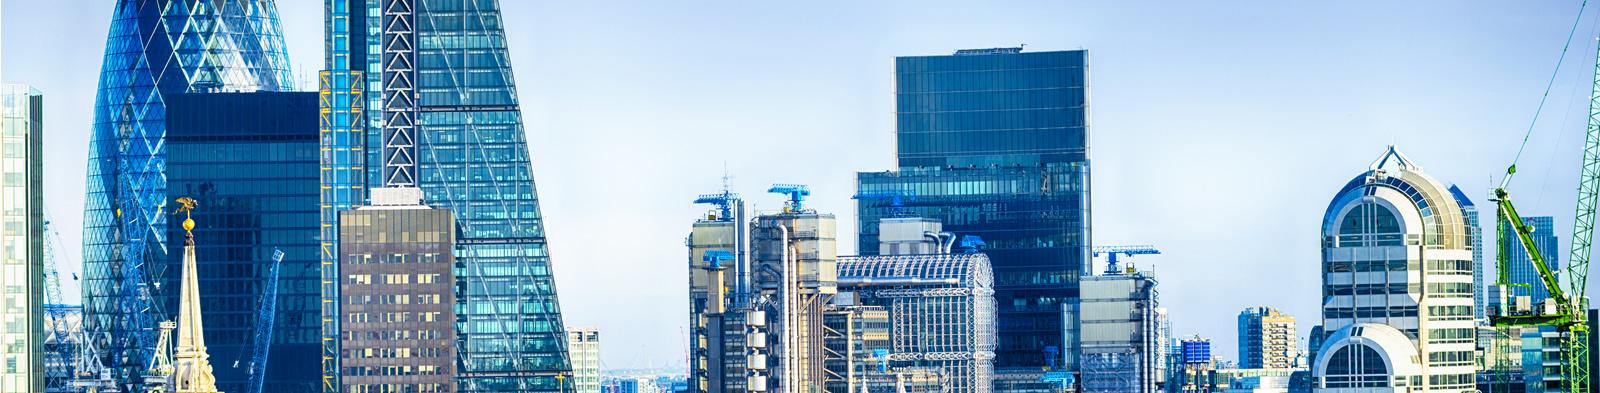 London skyline in bright sunlight